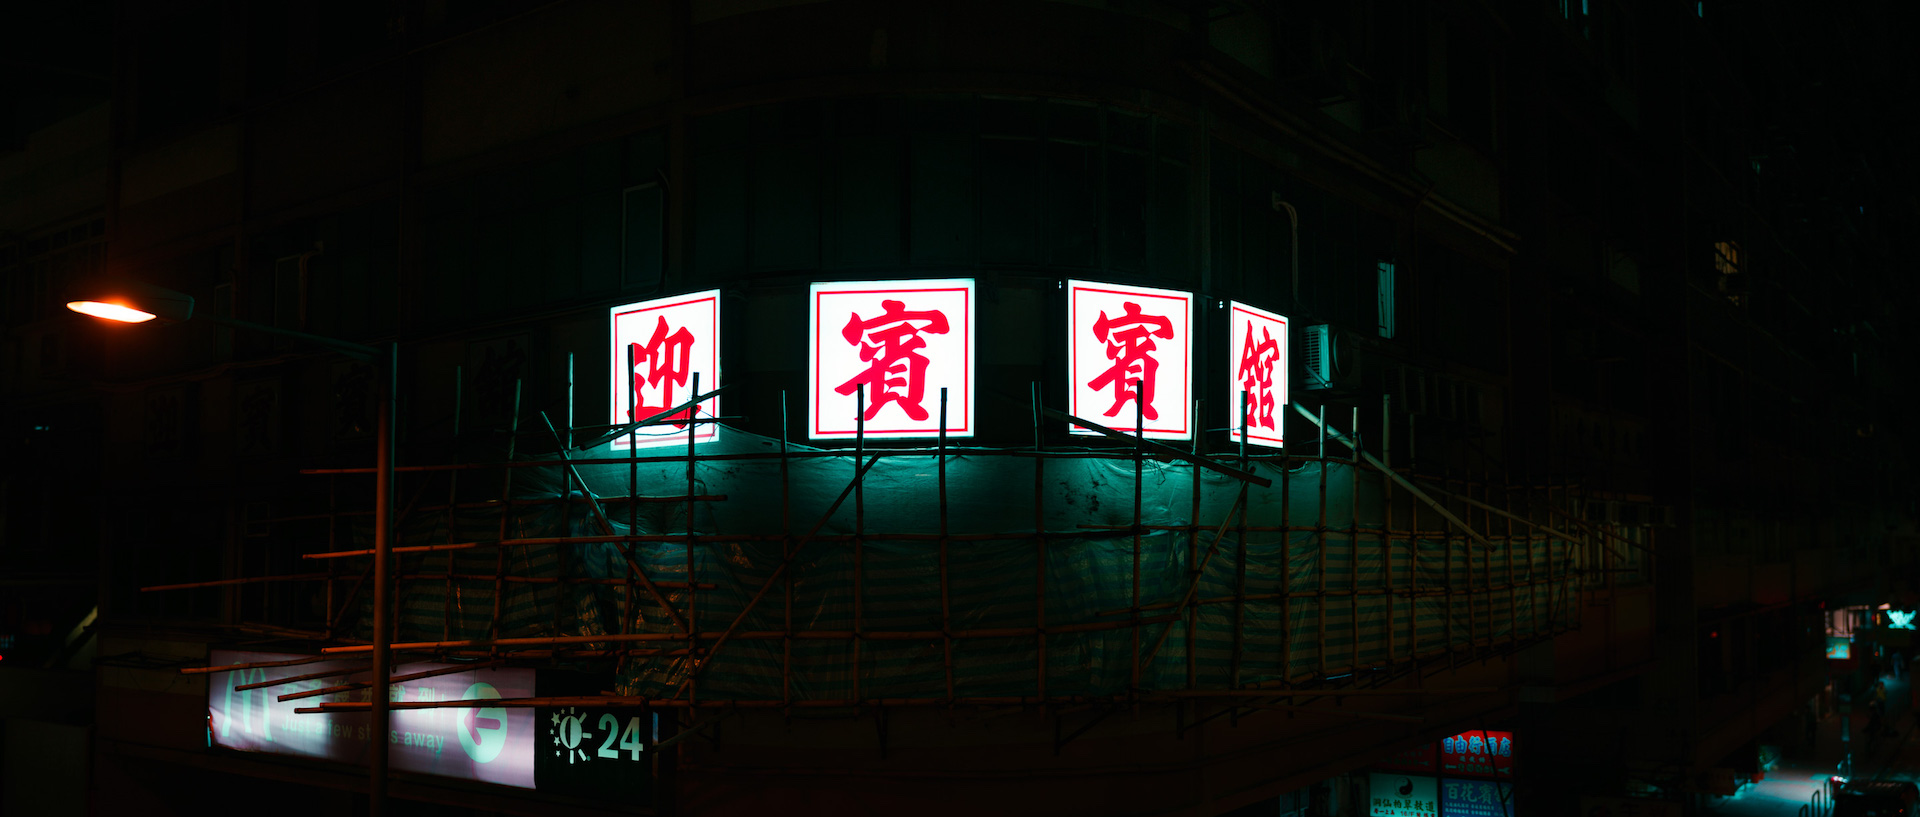 180911_113304_ProbablyJoel_HK-ON_1879-Pano.jpg